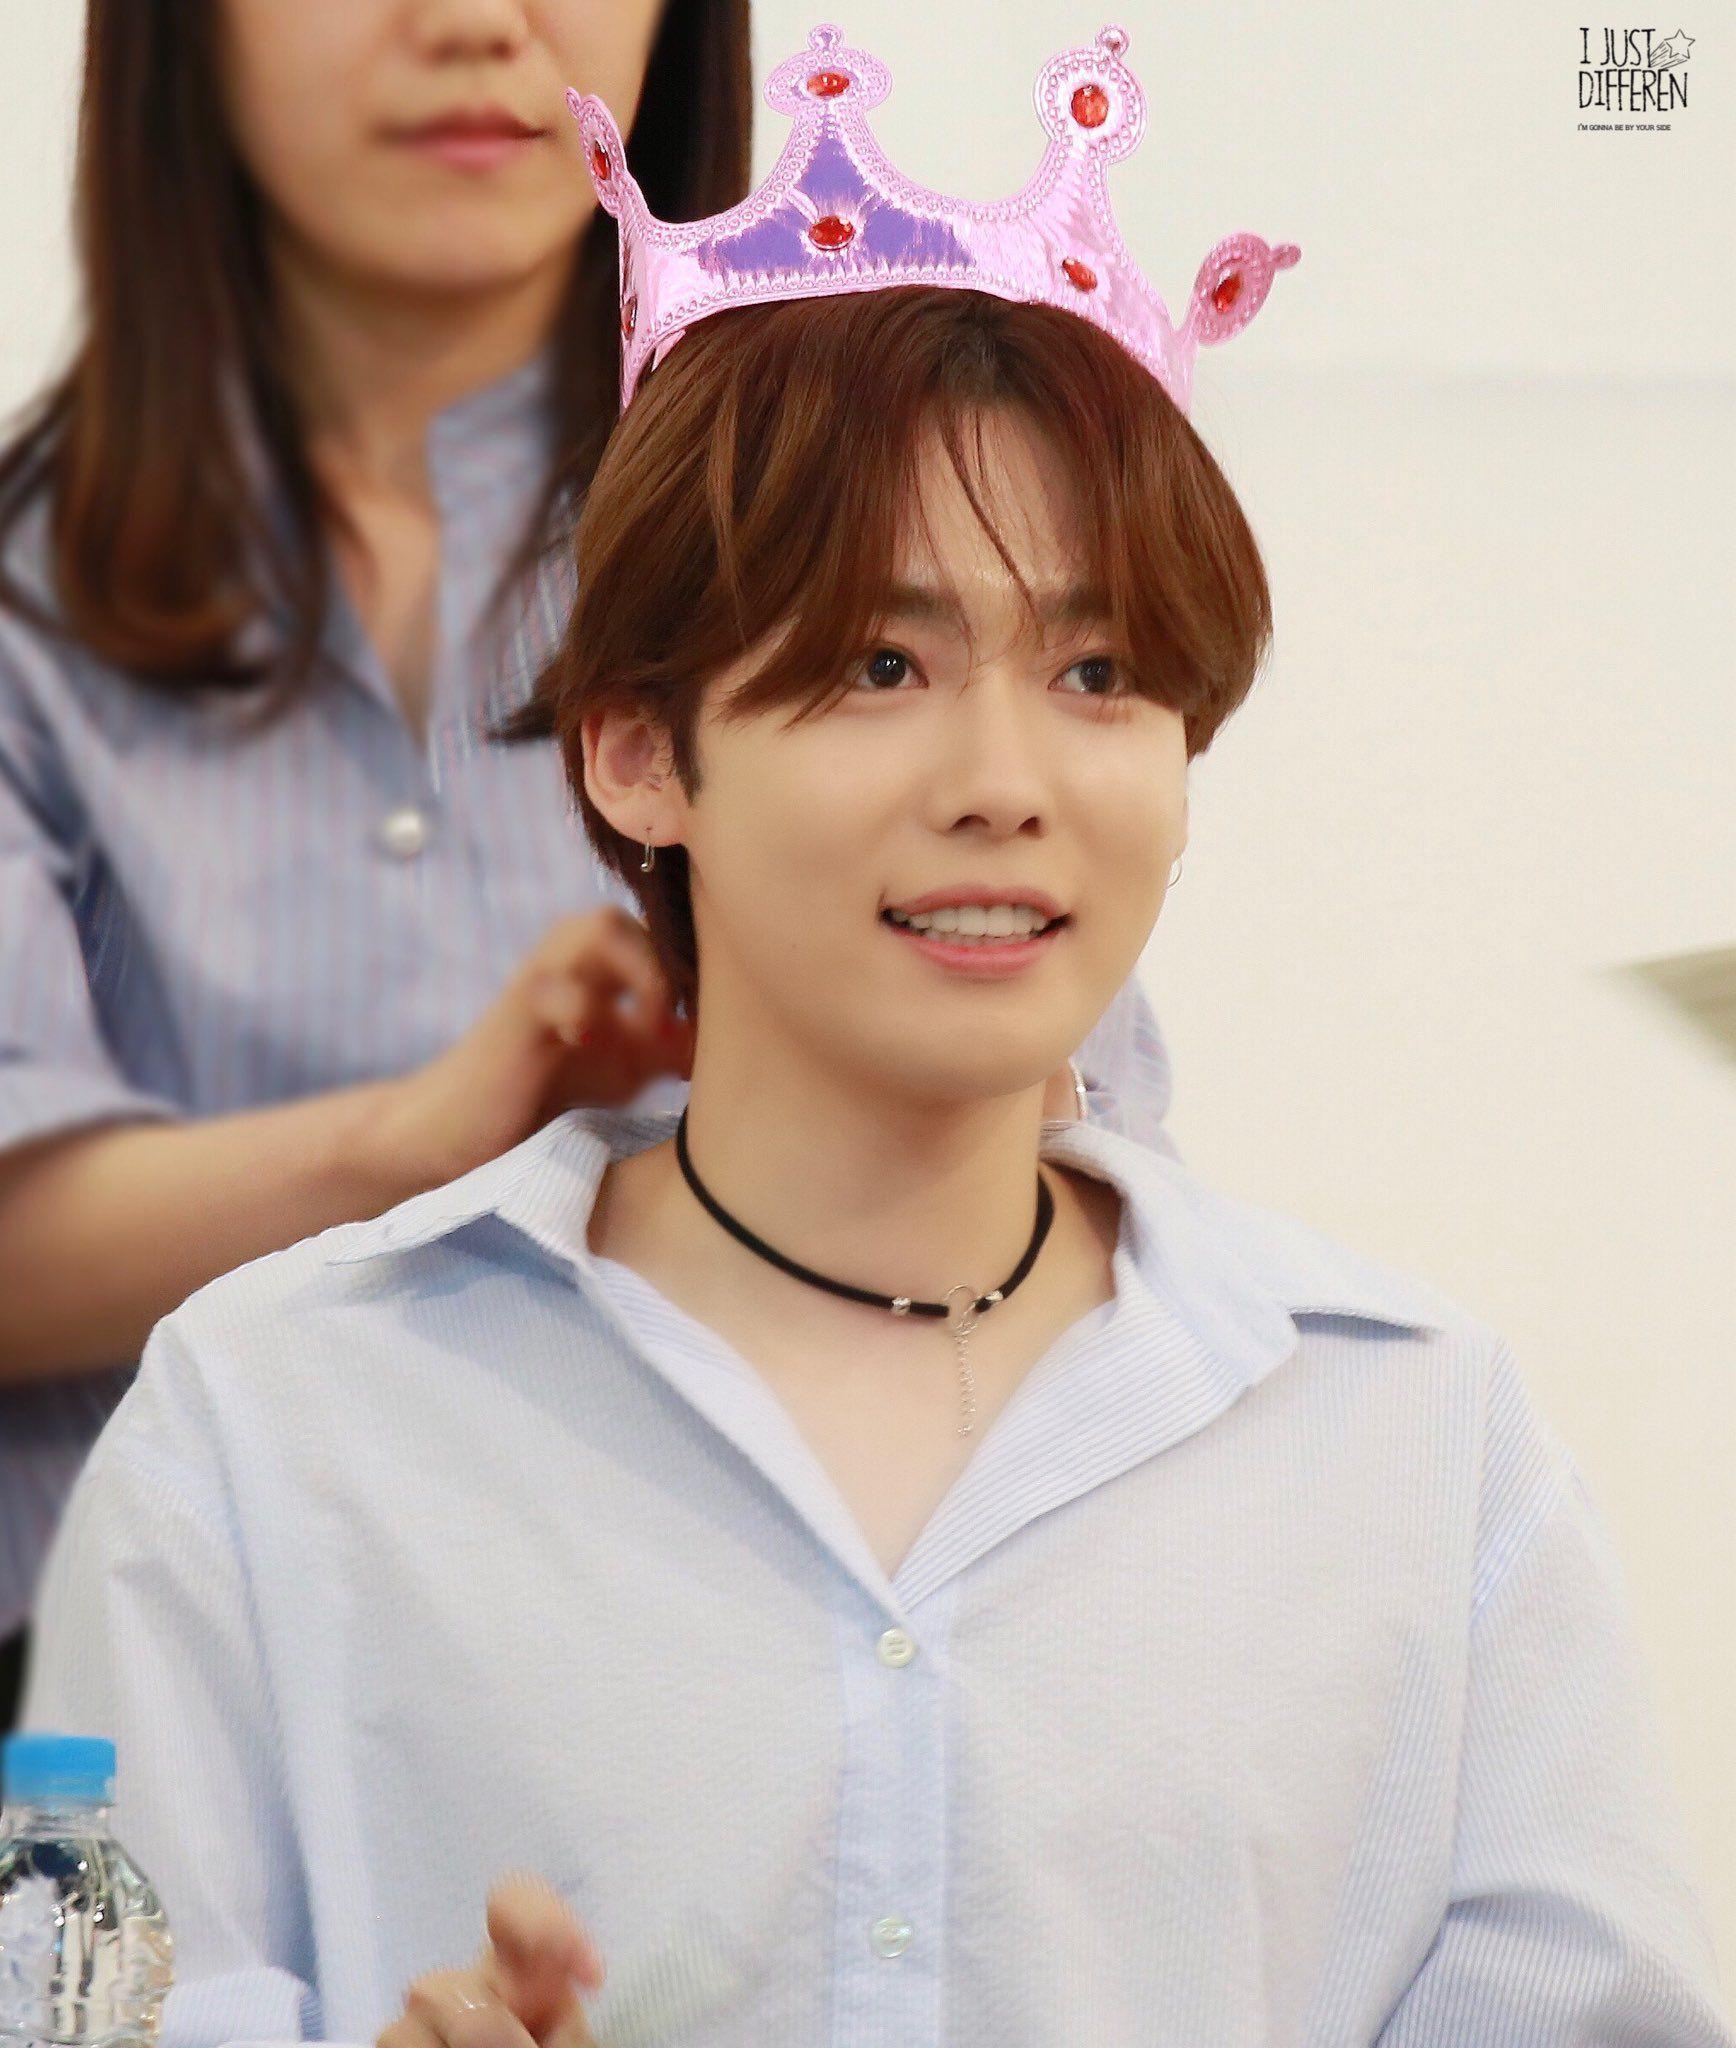 IJustDifferent on Winner jinwoo